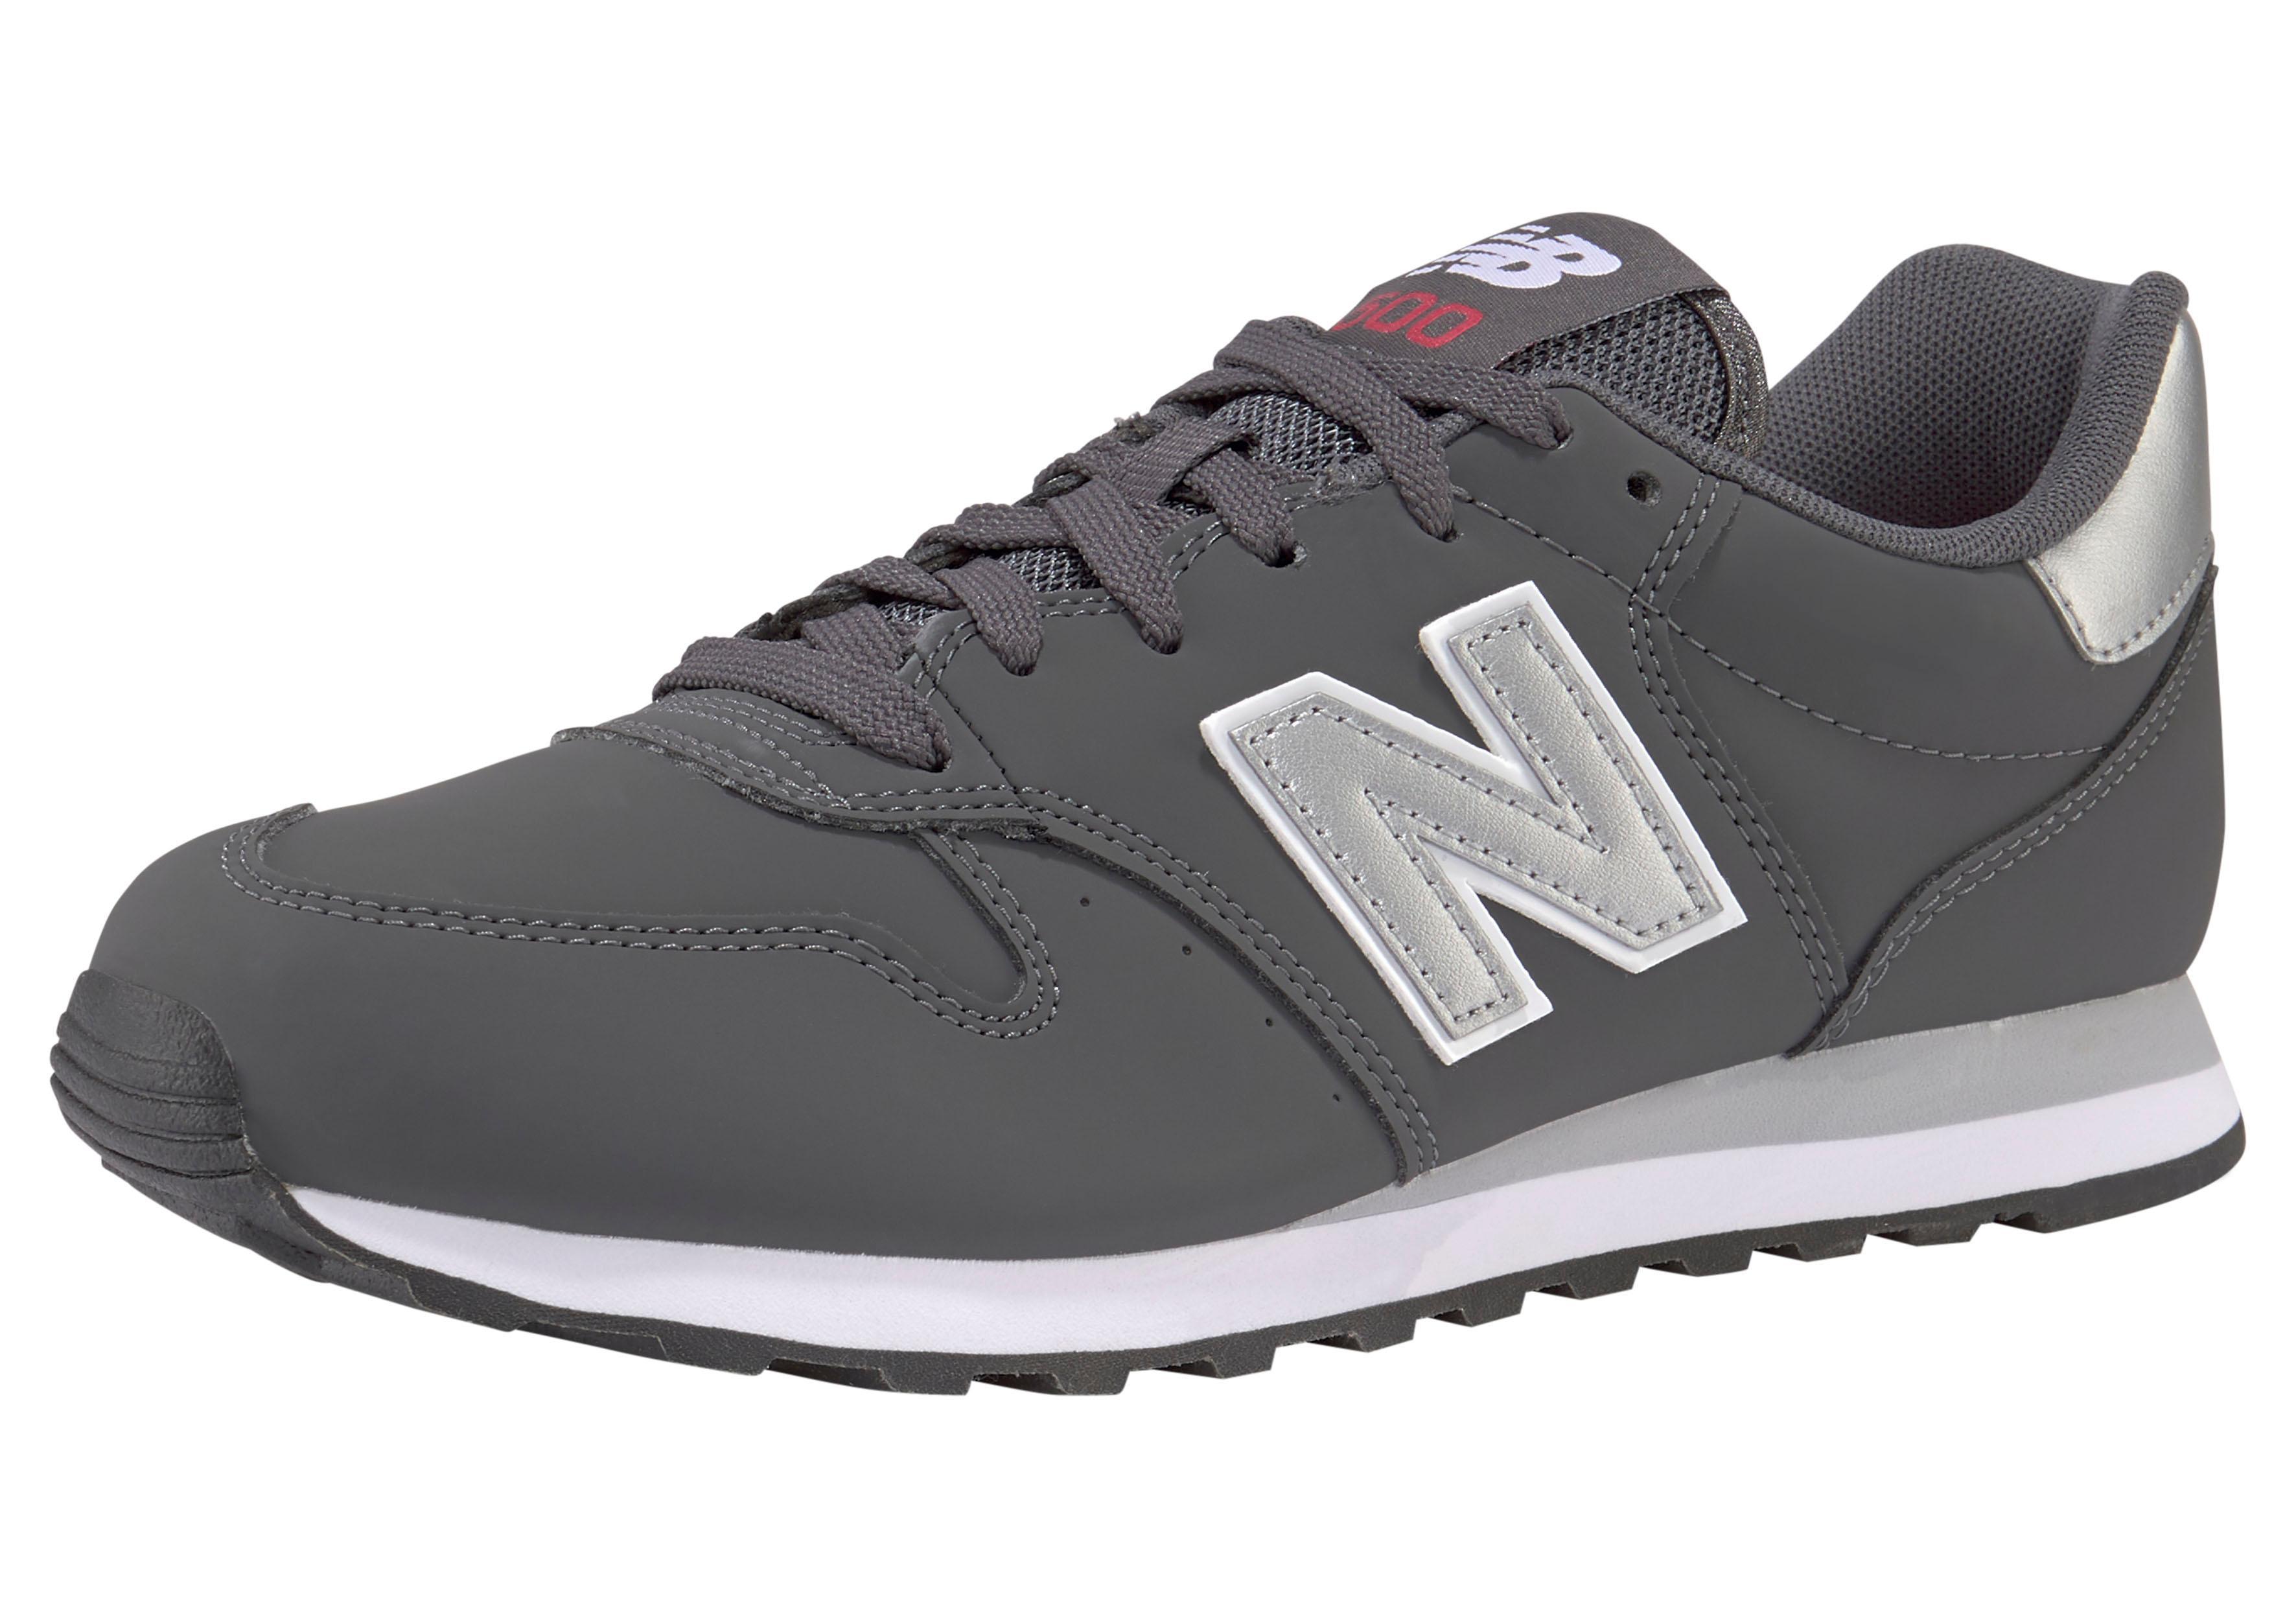 new balance sneaker gw 500 per rechnung baur. Black Bedroom Furniture Sets. Home Design Ideas